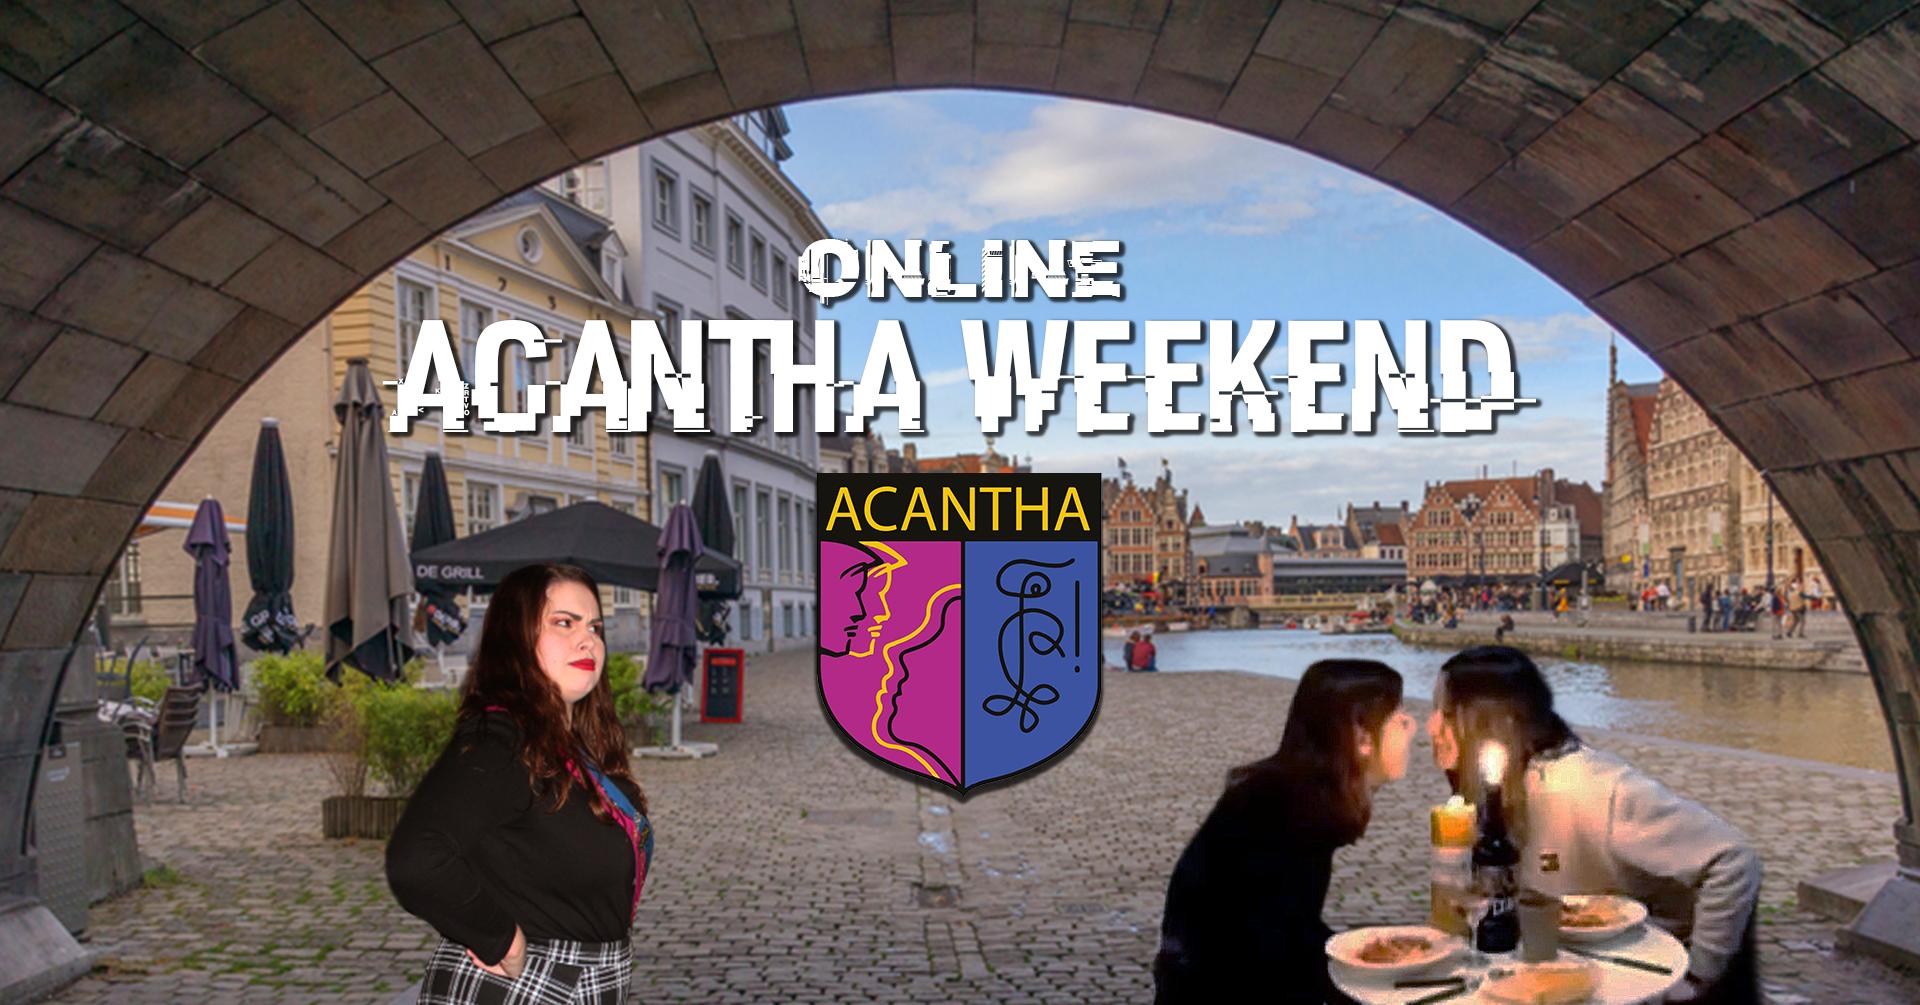 Acanthaweekend Online Gent